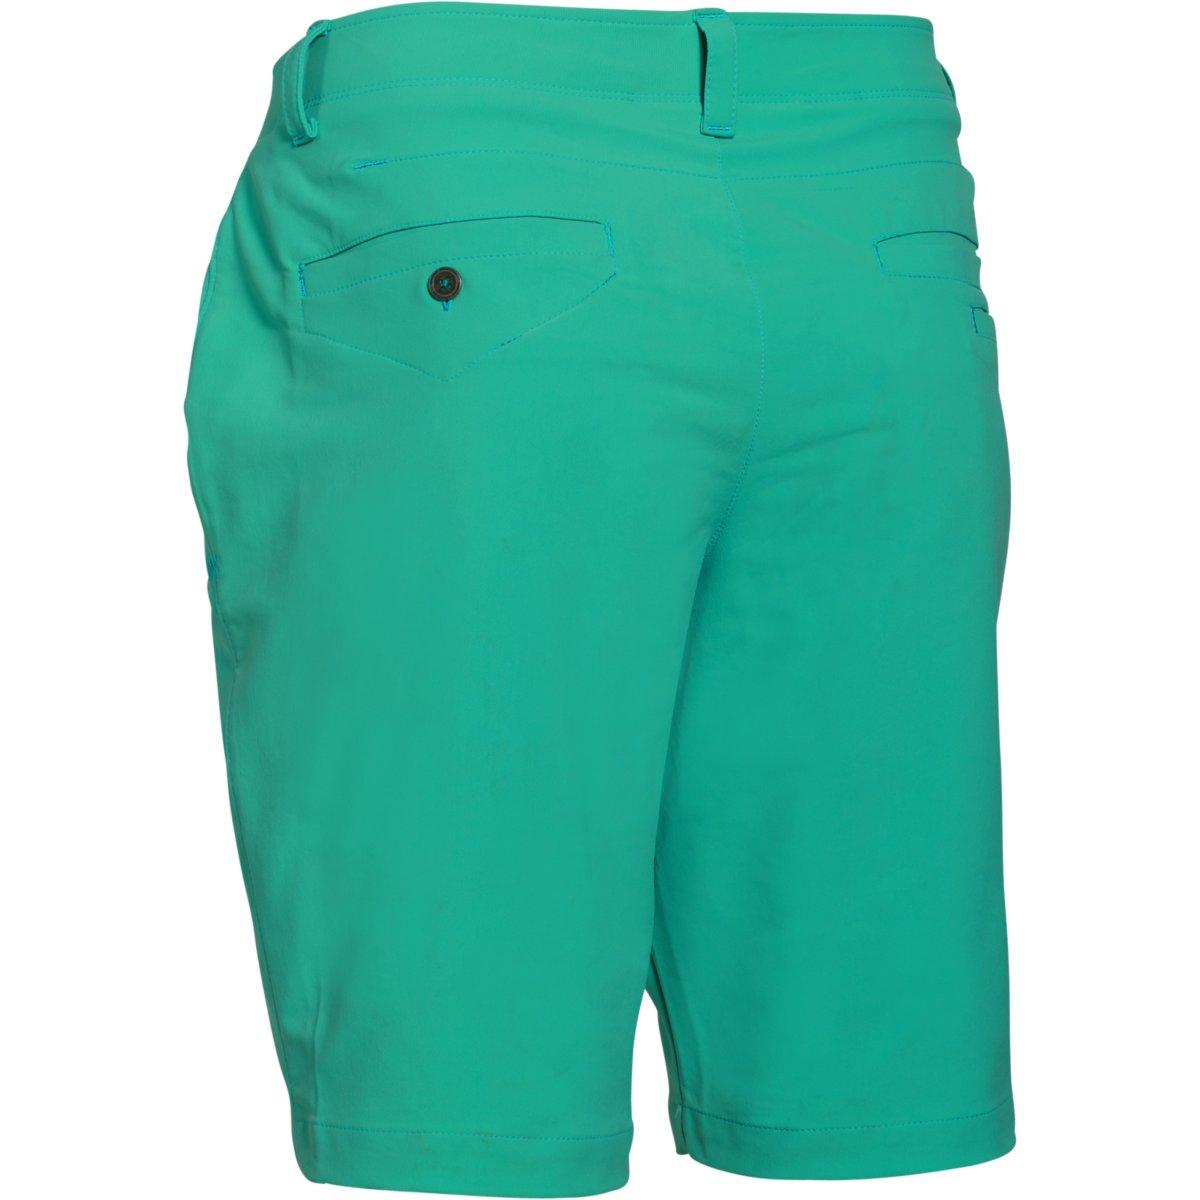 Under-Armour-Mens-UA-Match-Play-Taper-Tech-Performance-Summer-Golf-Shorts thumbnail 13